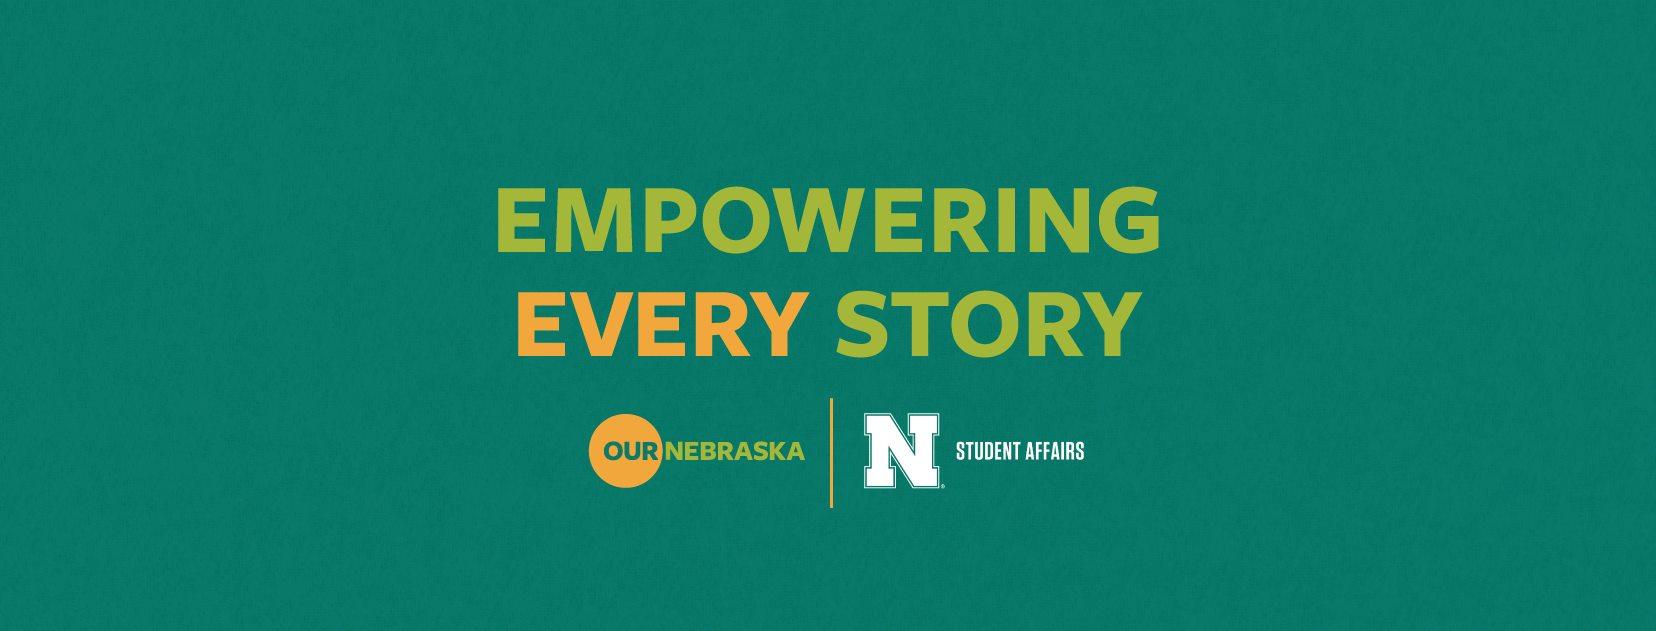 Our Nebraska Empowering Every Story